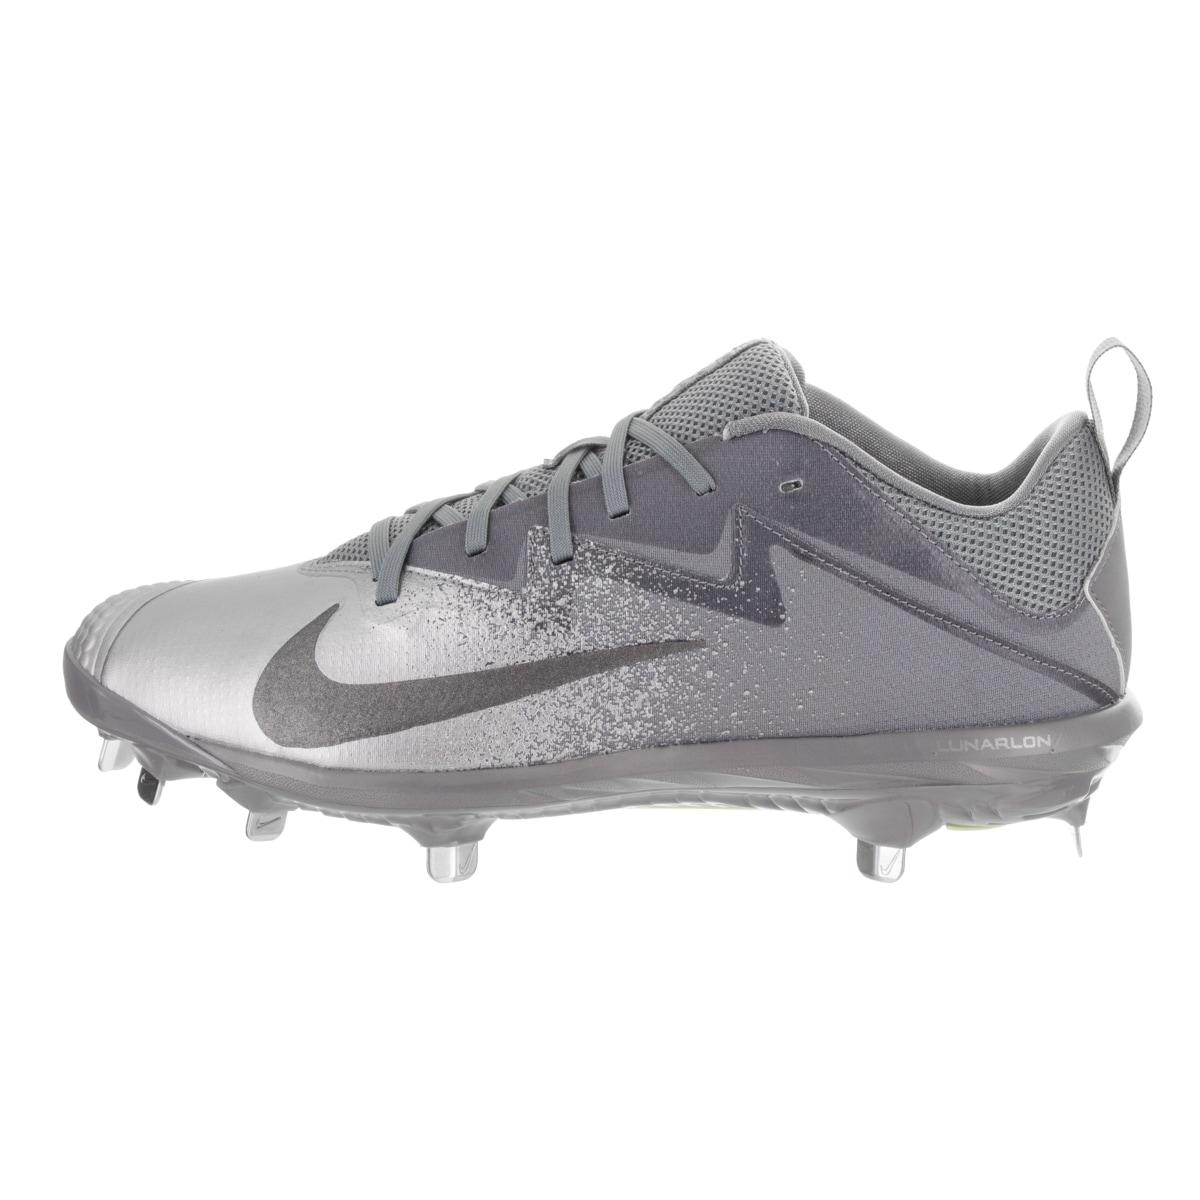 f5ba7100a0cb Shop Nike Men's Lunar Vapor Ultrafly Pro Grey Textile Baseball Cleats -  Ships To Canada - Overstock - 15269258